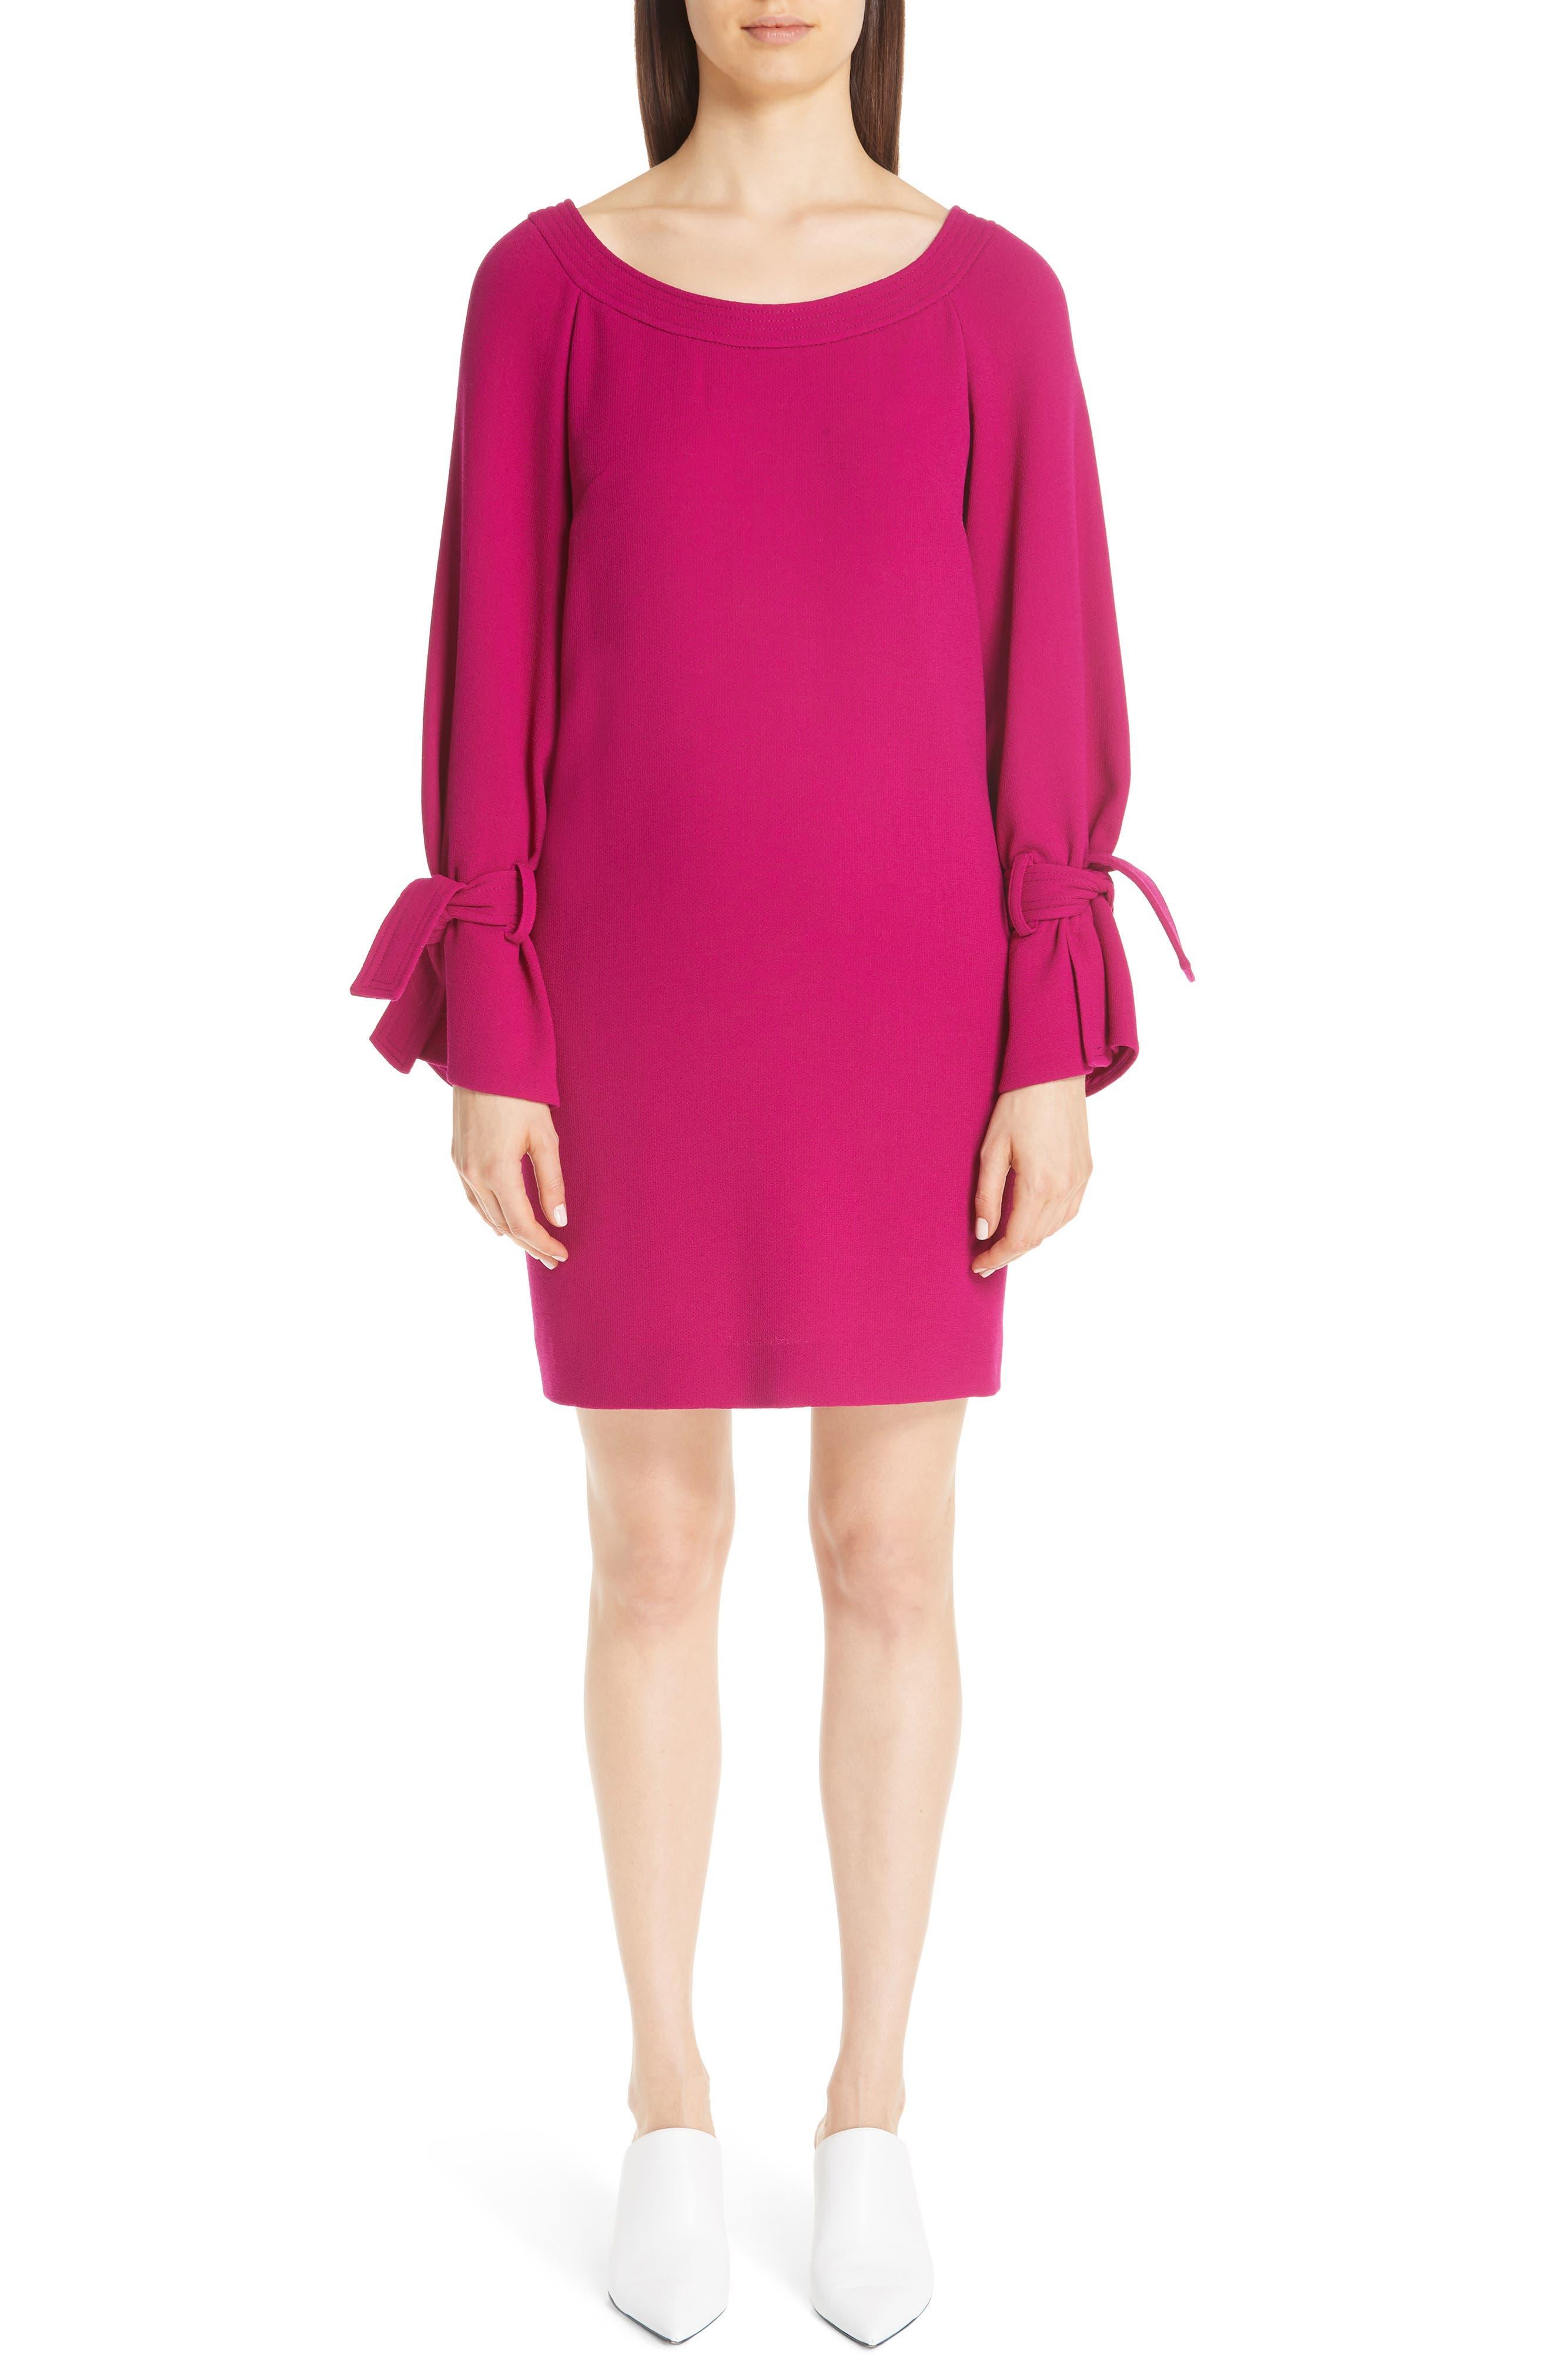 LELA ROSE, Tie Cuff Wool Blend Crepe Shift Dress, Alternate thumbnail 5, color, MAGENTA